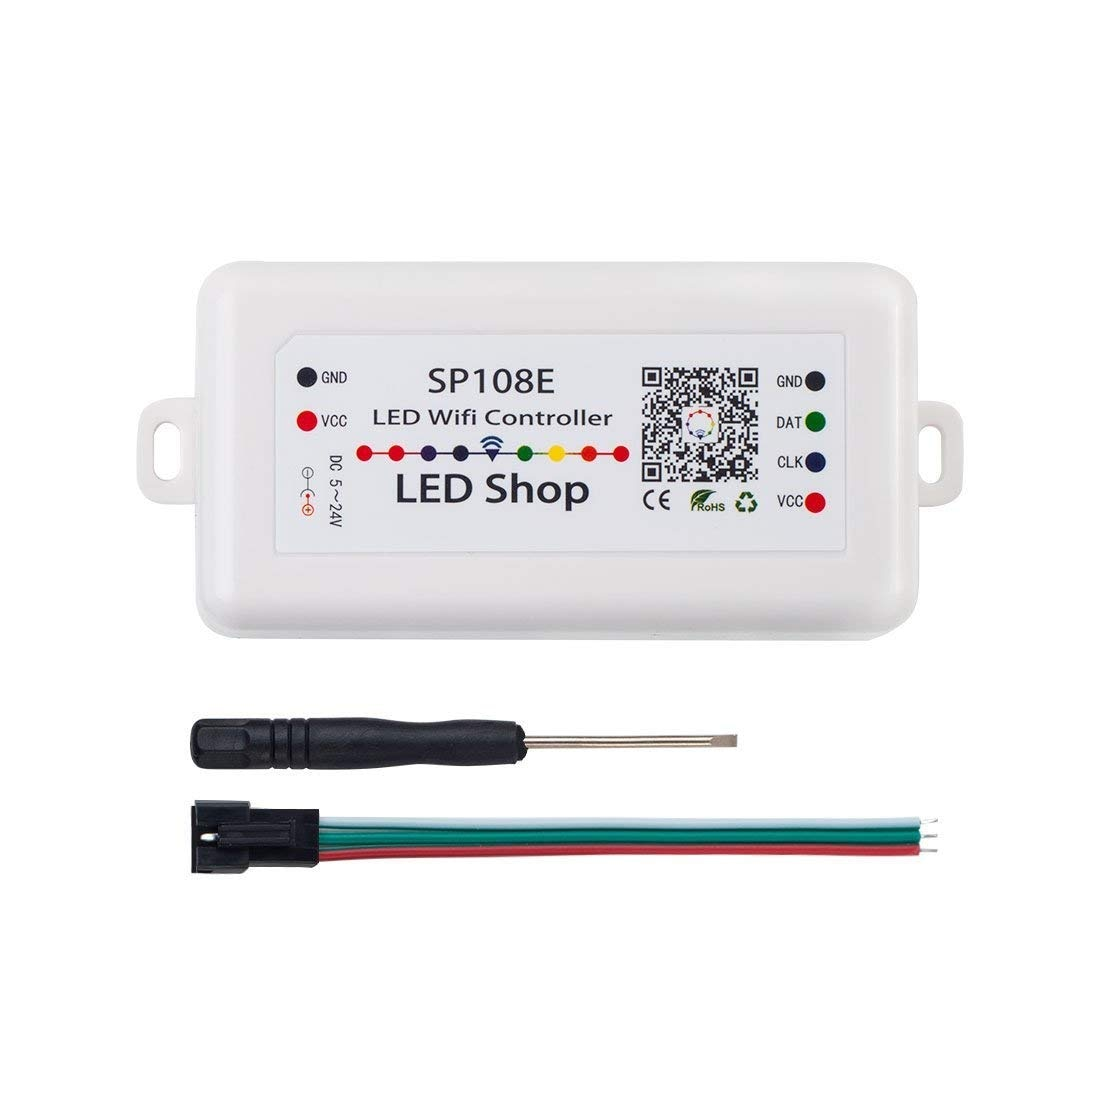 SP108E controlador inalámbrico Bluetooth APP WS2811 WS2812B WS2801 SK6812 APA102 individualmente direccionable, programable